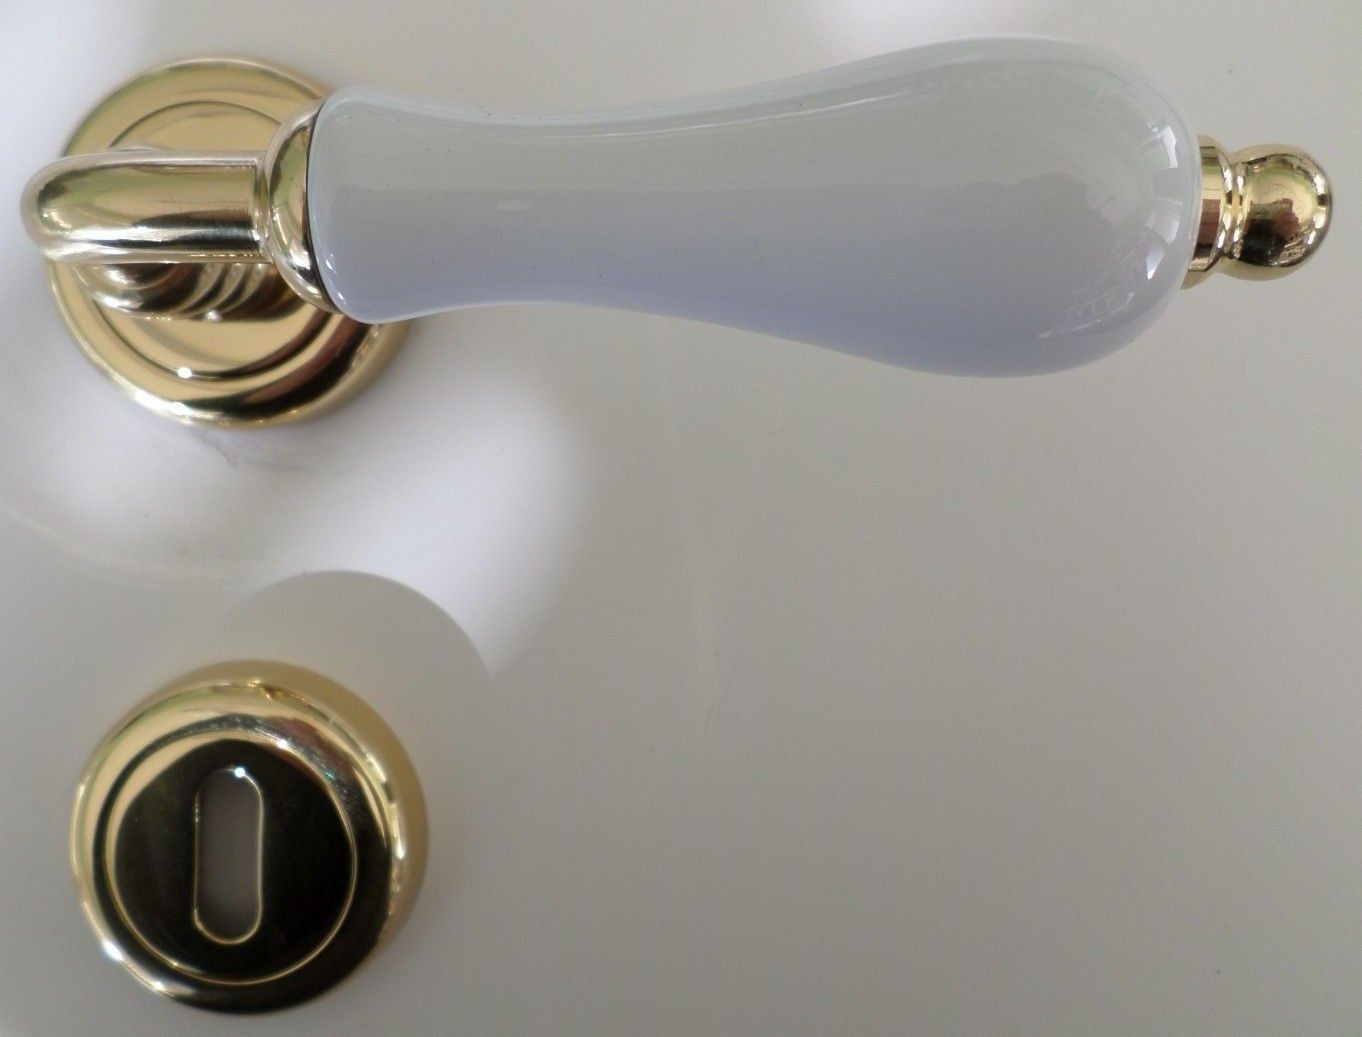 Maniglie Per Porte Interne In Porcellana.Maniglie Per Porte Interne Porcellana Bianca Ottone Lucido